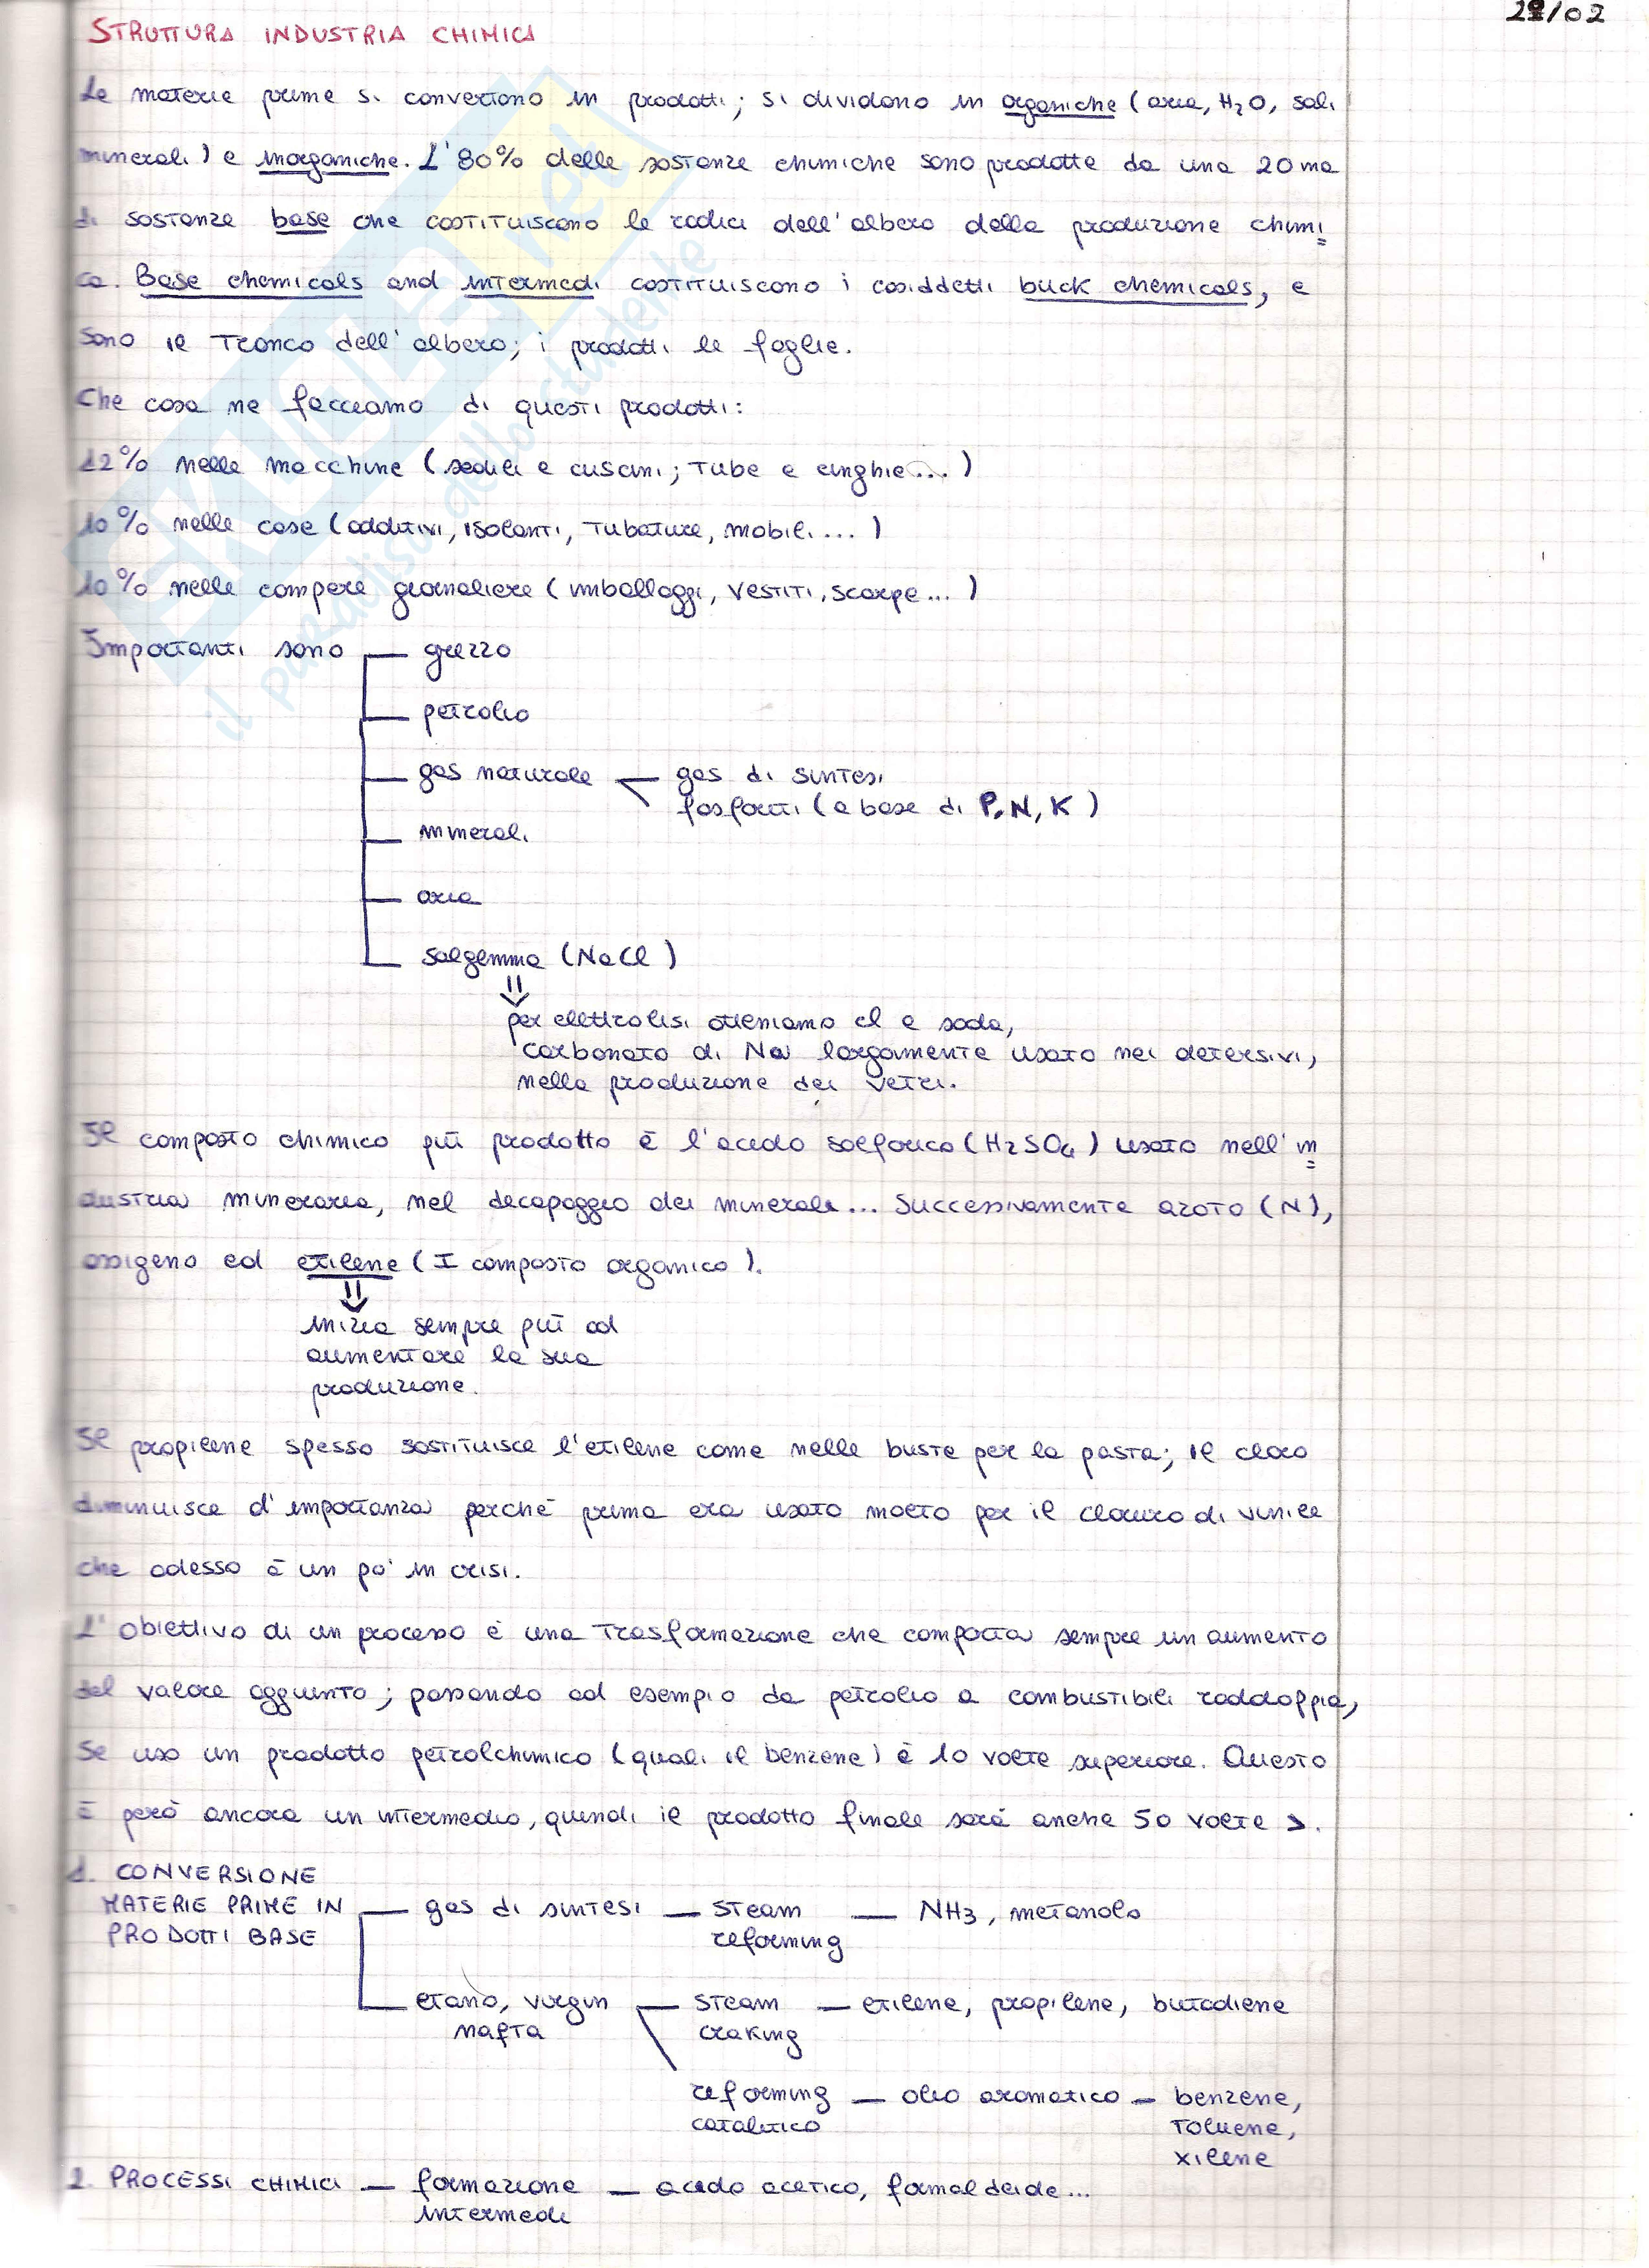 Processi di chimica industriale - Appunti Pag. 1